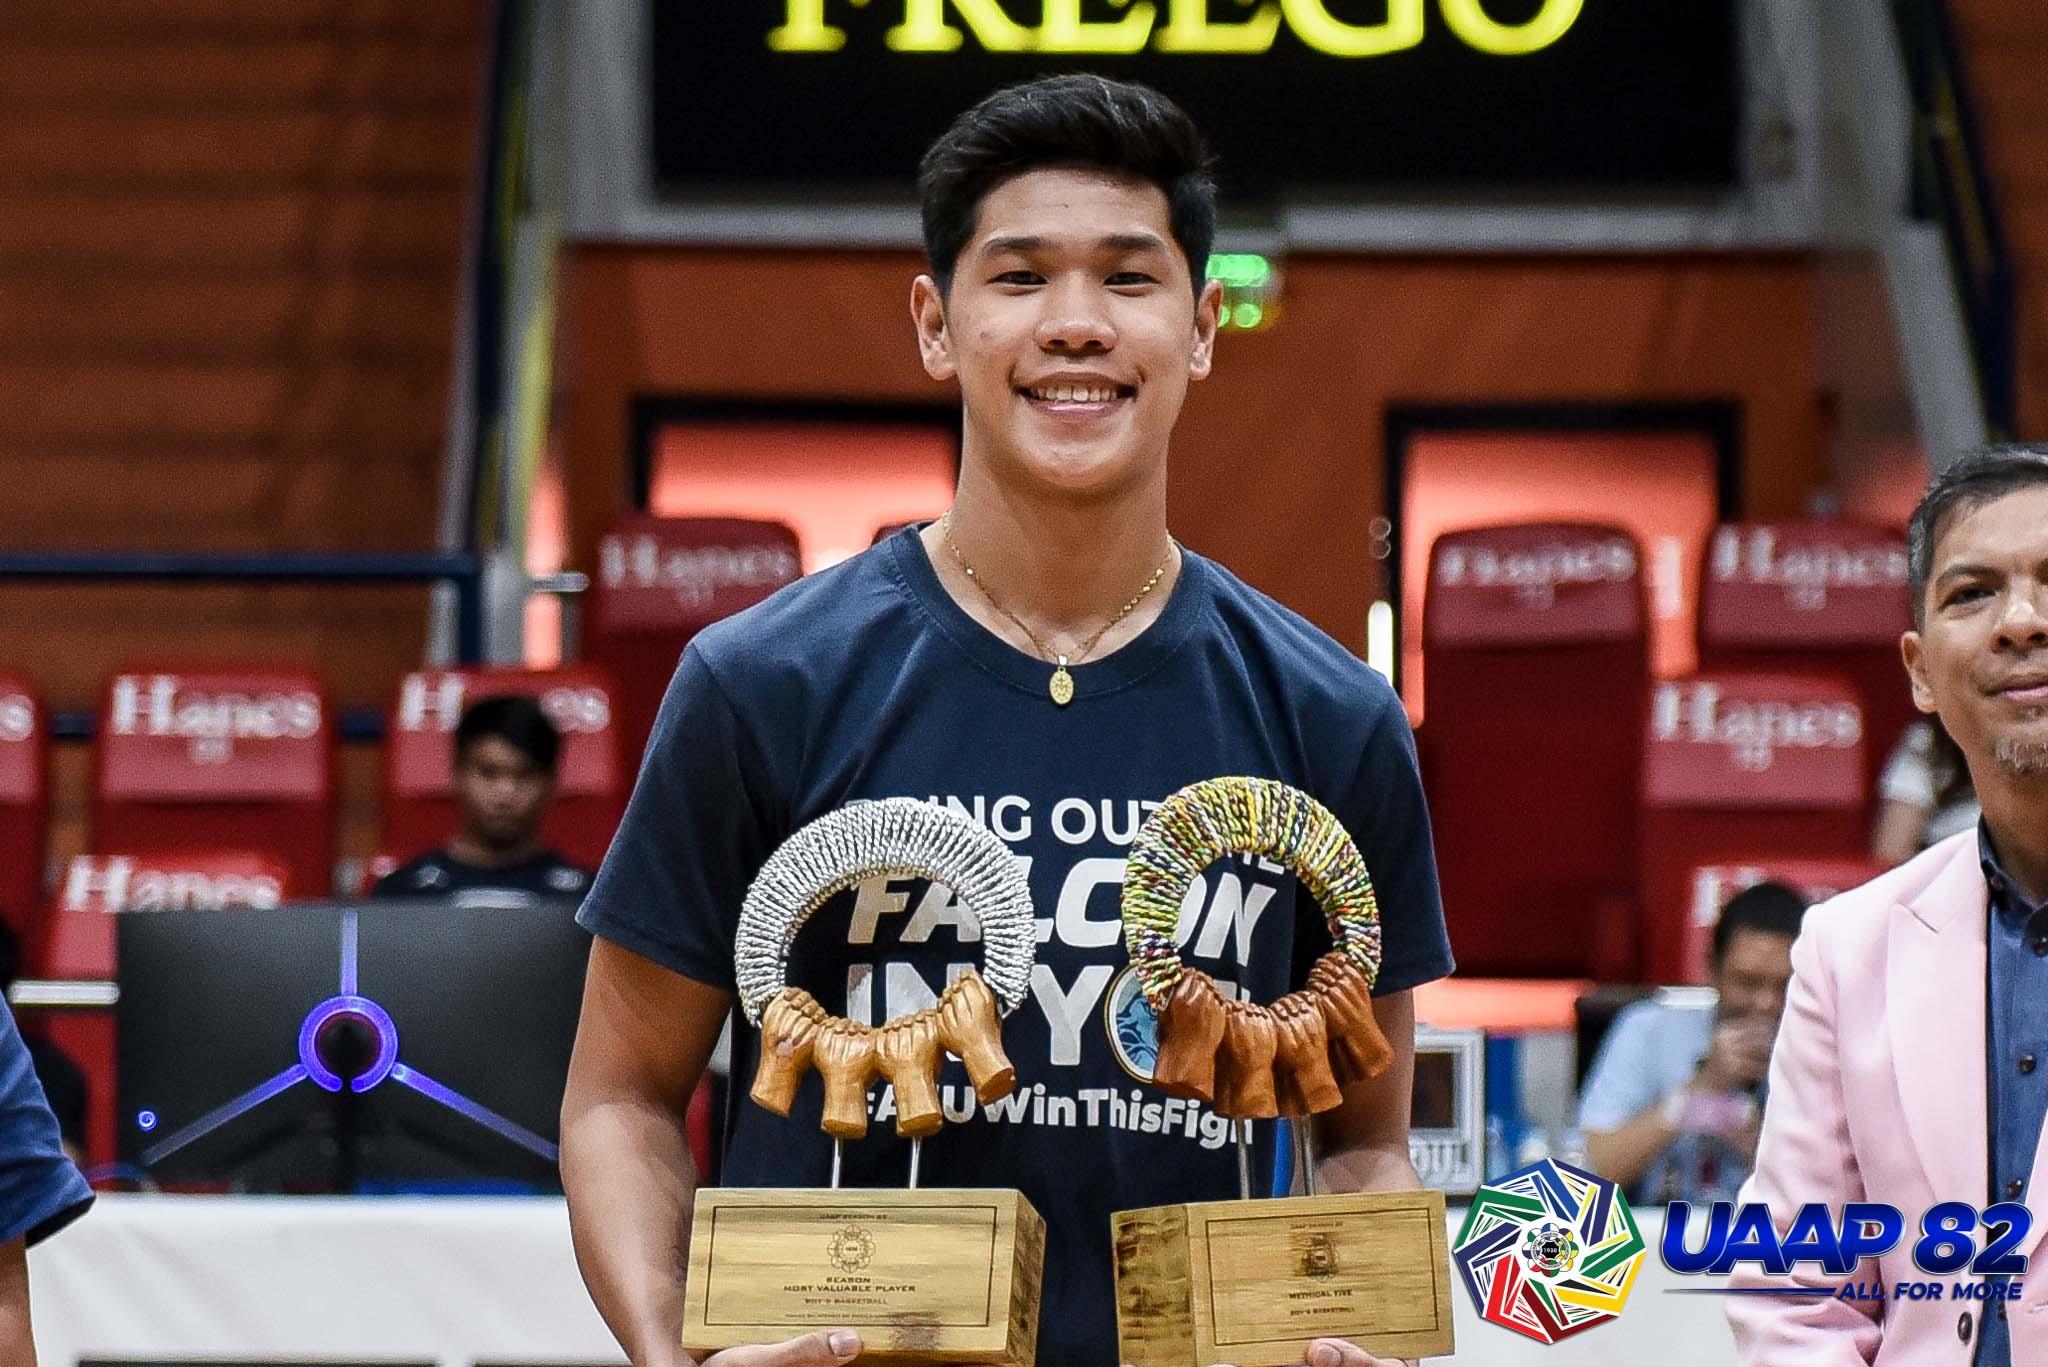 UAAP82-BOYS-BB-M5-4TH-PHOTO-ADU-MVP-FIGUEROA Fortea, Figueroa, Estacio lead crack UAAP HS class of '21 ADMU Basketball FEU News NU UAAP UP UST  - philippine sports news